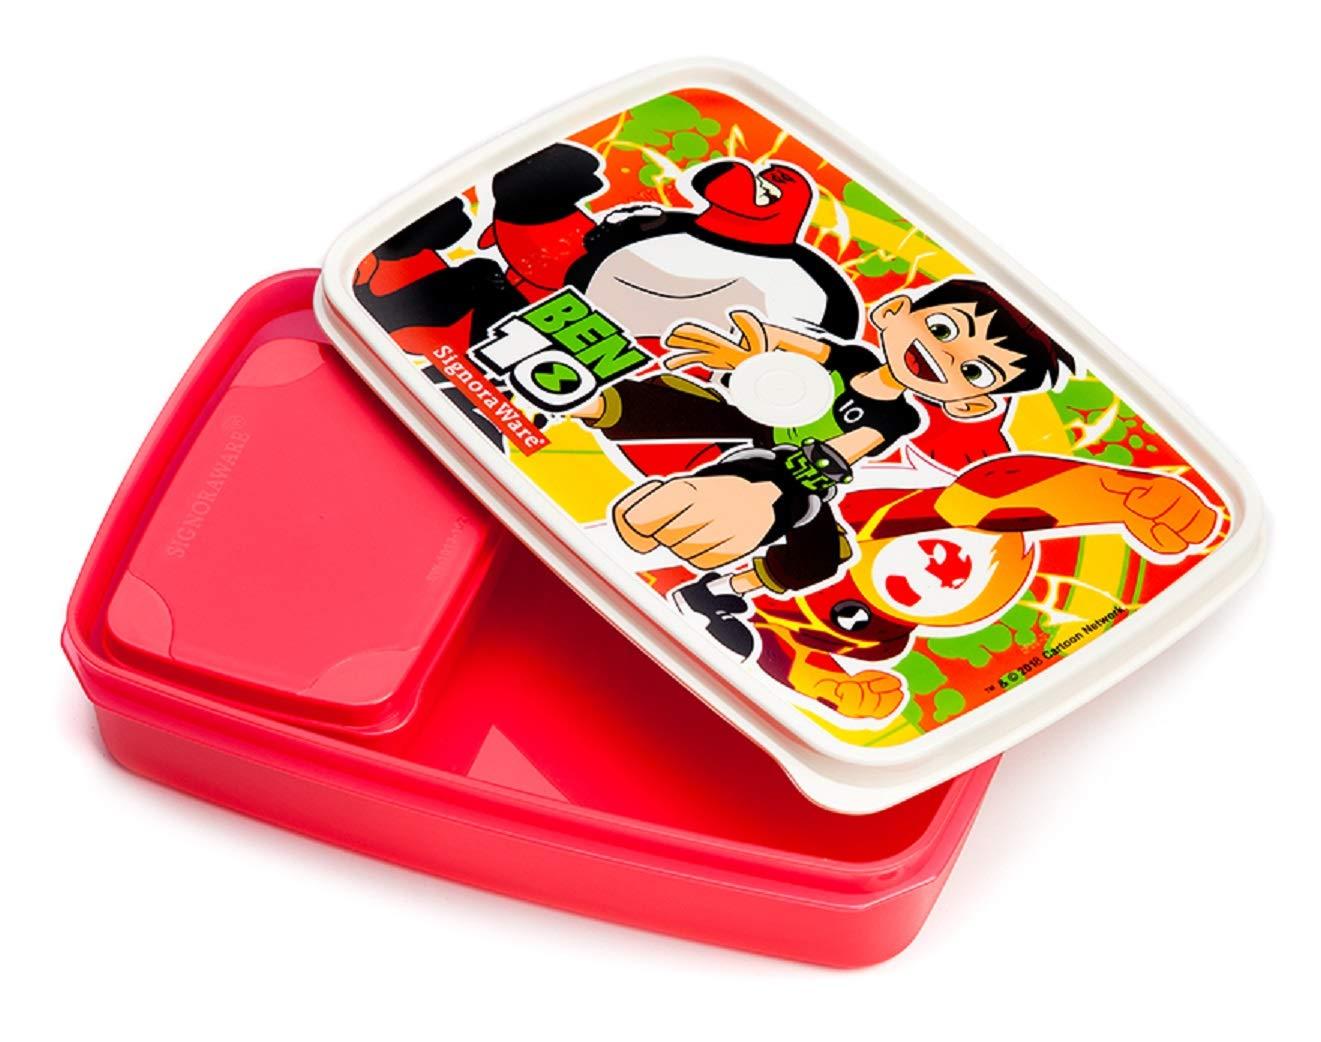 Signoraware Easy Lunch Box (Ben10 Orange), 150ml+850ml, Set of 2, Red